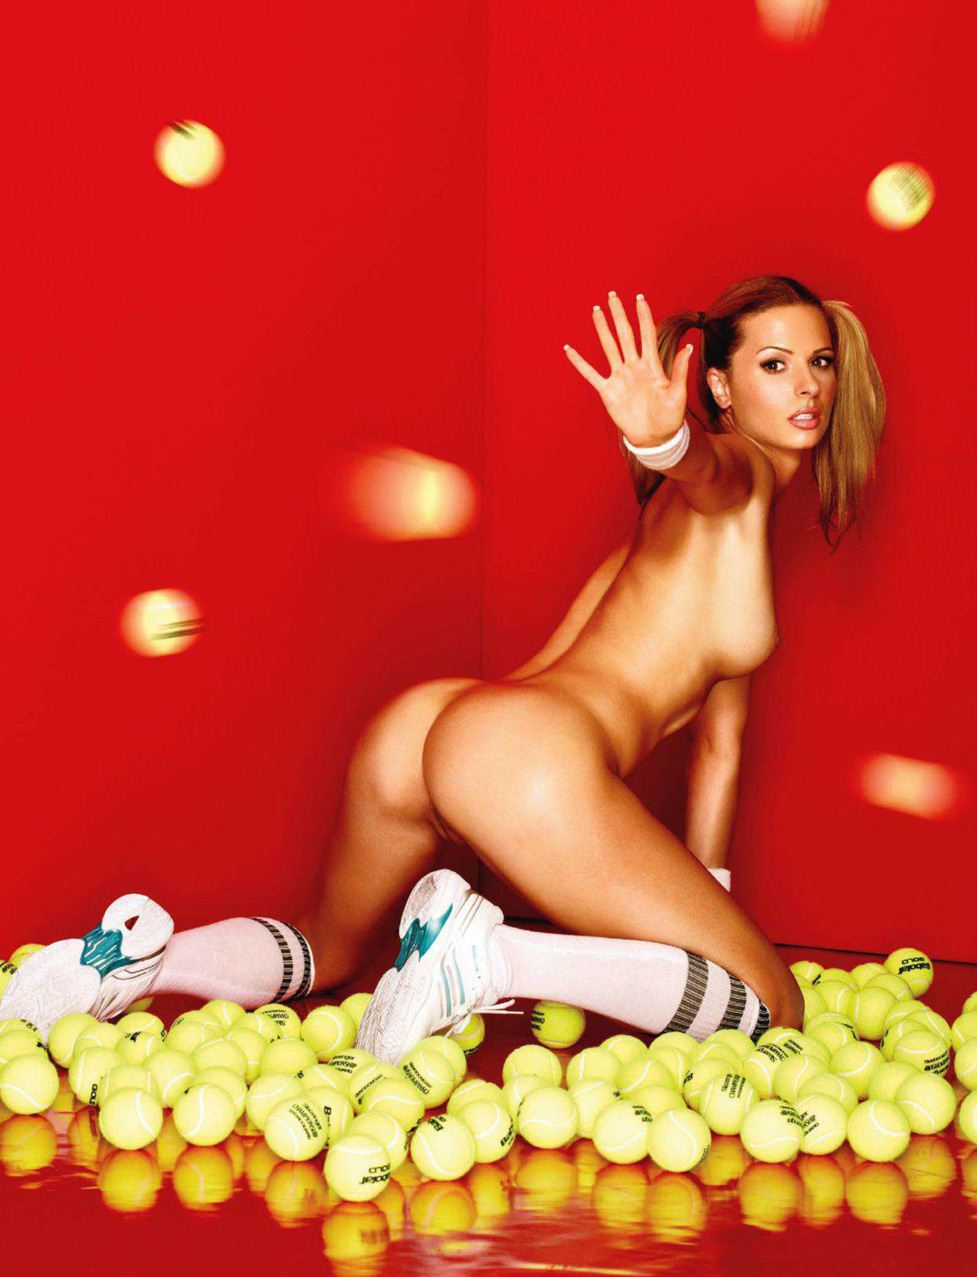 Любица Аврамович / Ljubica Avramovic in Playboy Serbia july-august 2011